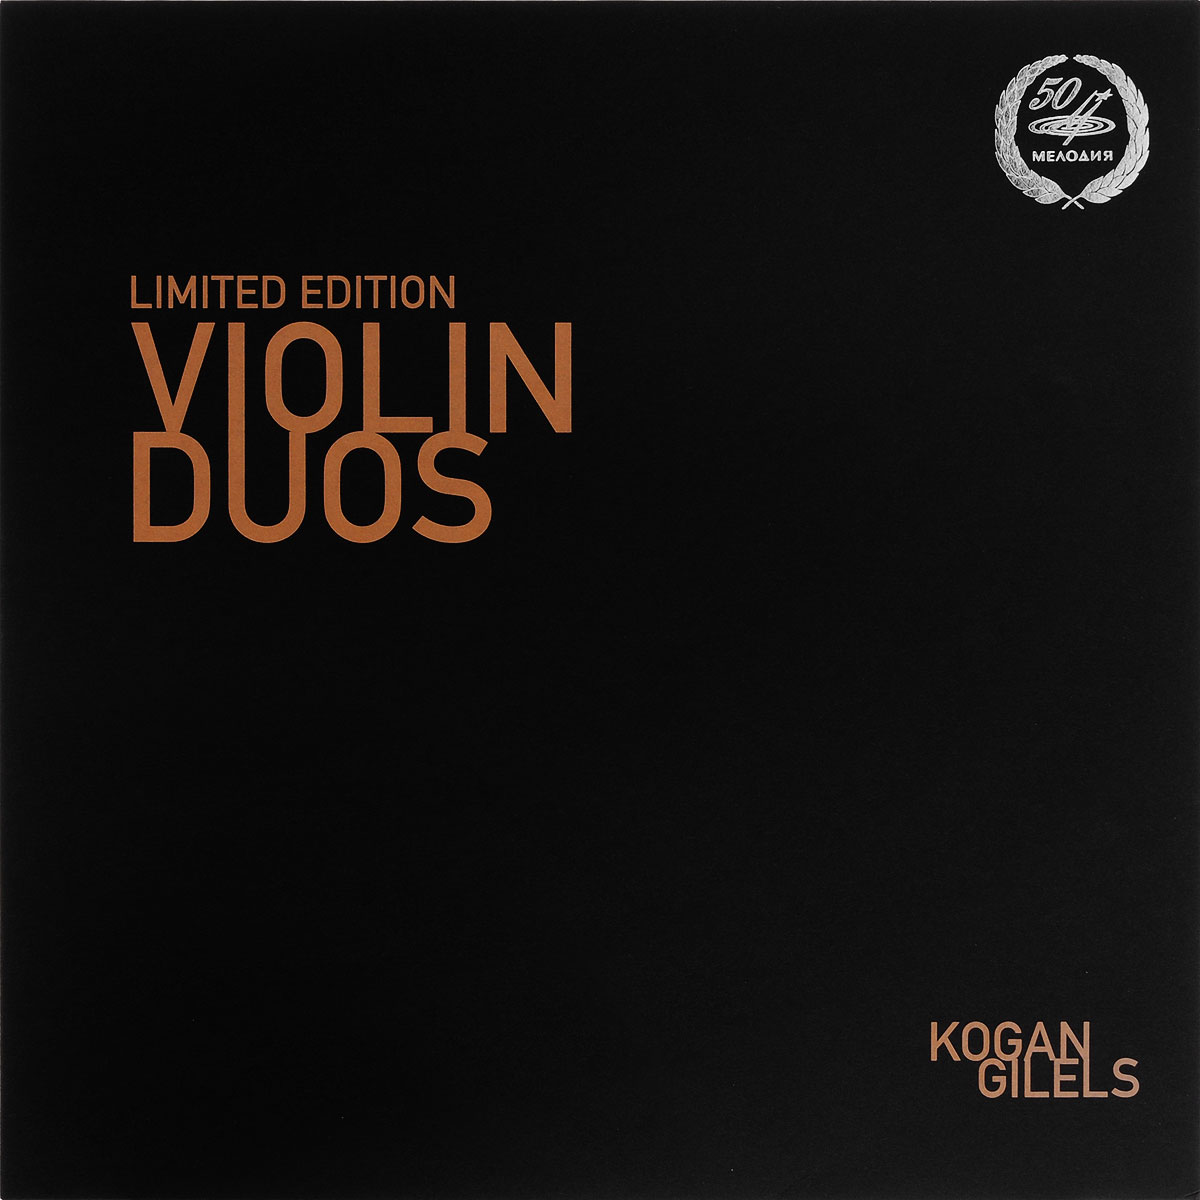 LP 1:Tracks 1 - 9 LP 2:Tracks 10 - 12